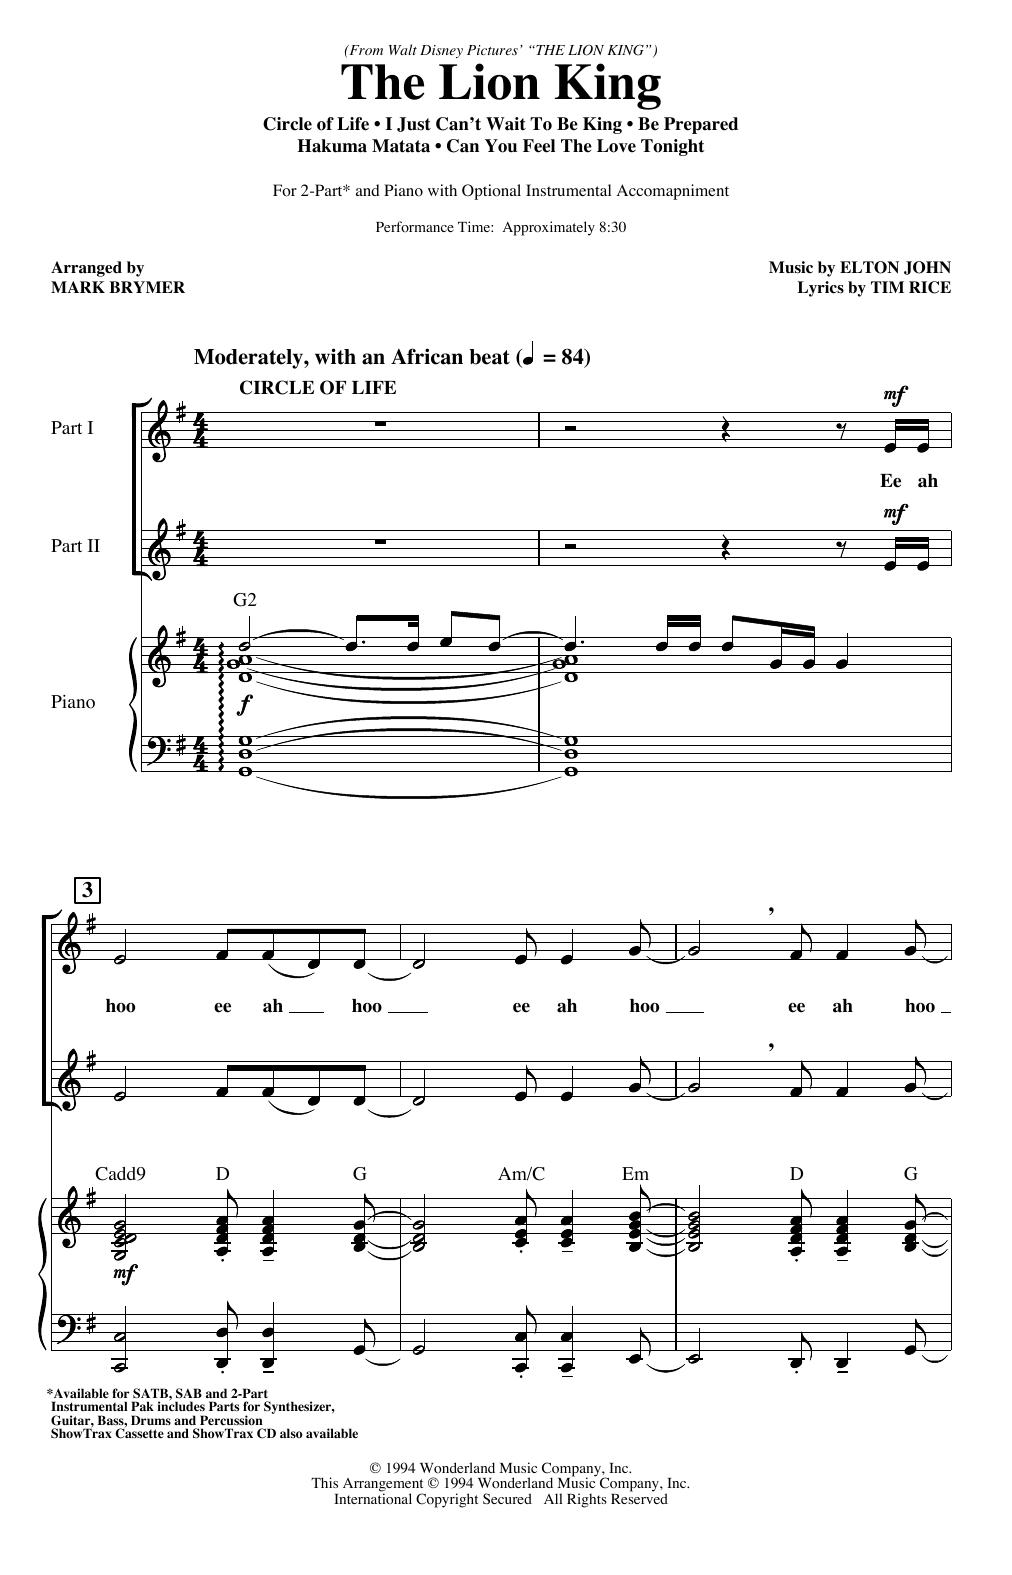 The Lion King (Medley) (arr. Mark Brymer) Partituras Digitales